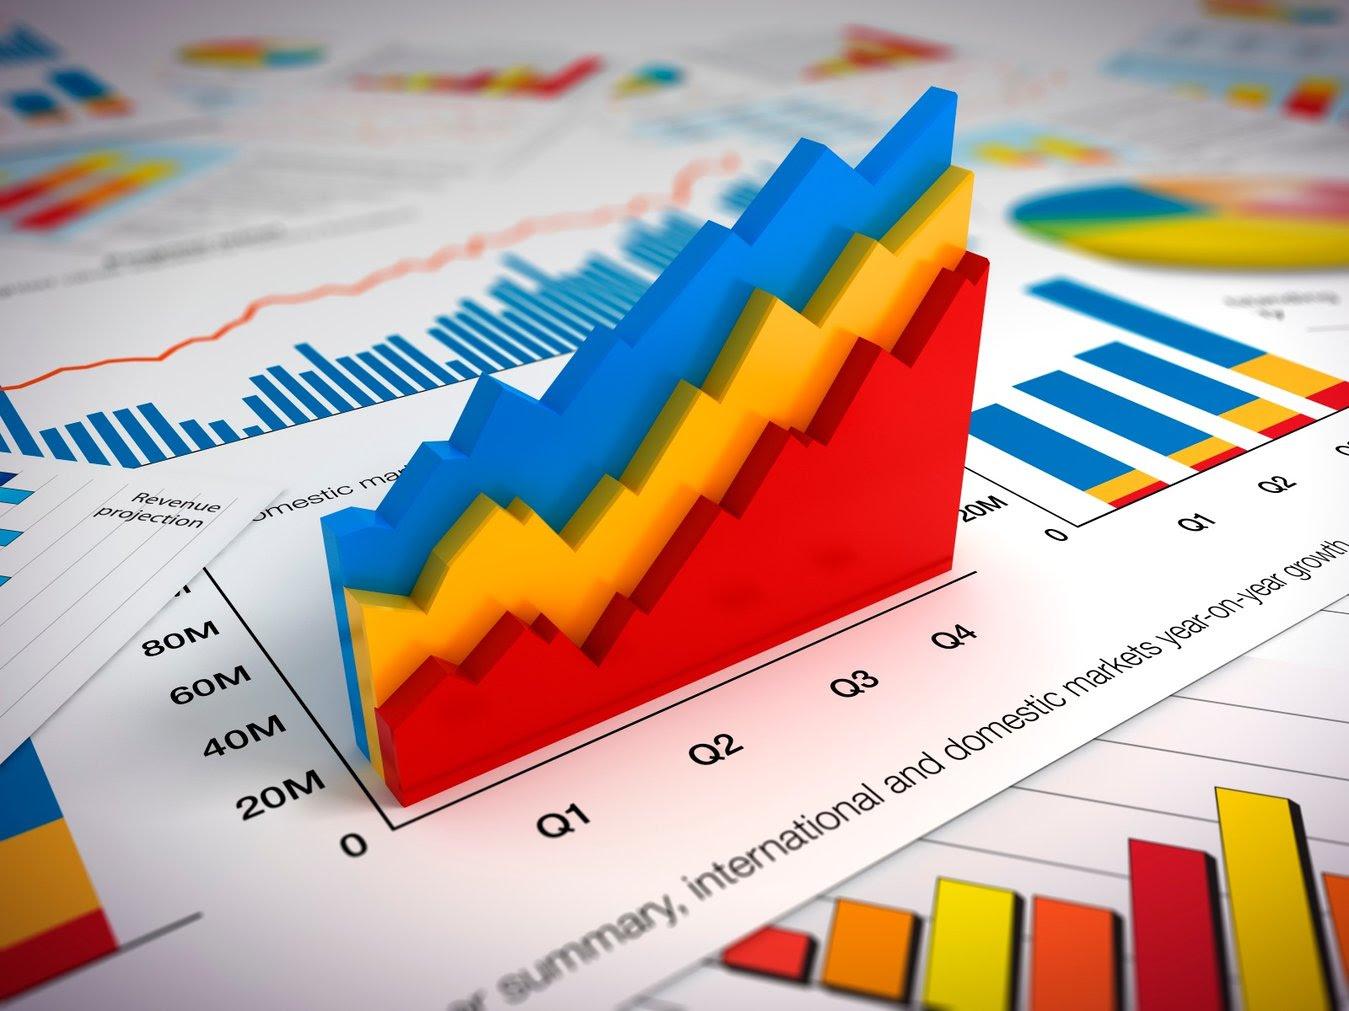 retail-industry-analysis-perdictions.jpg